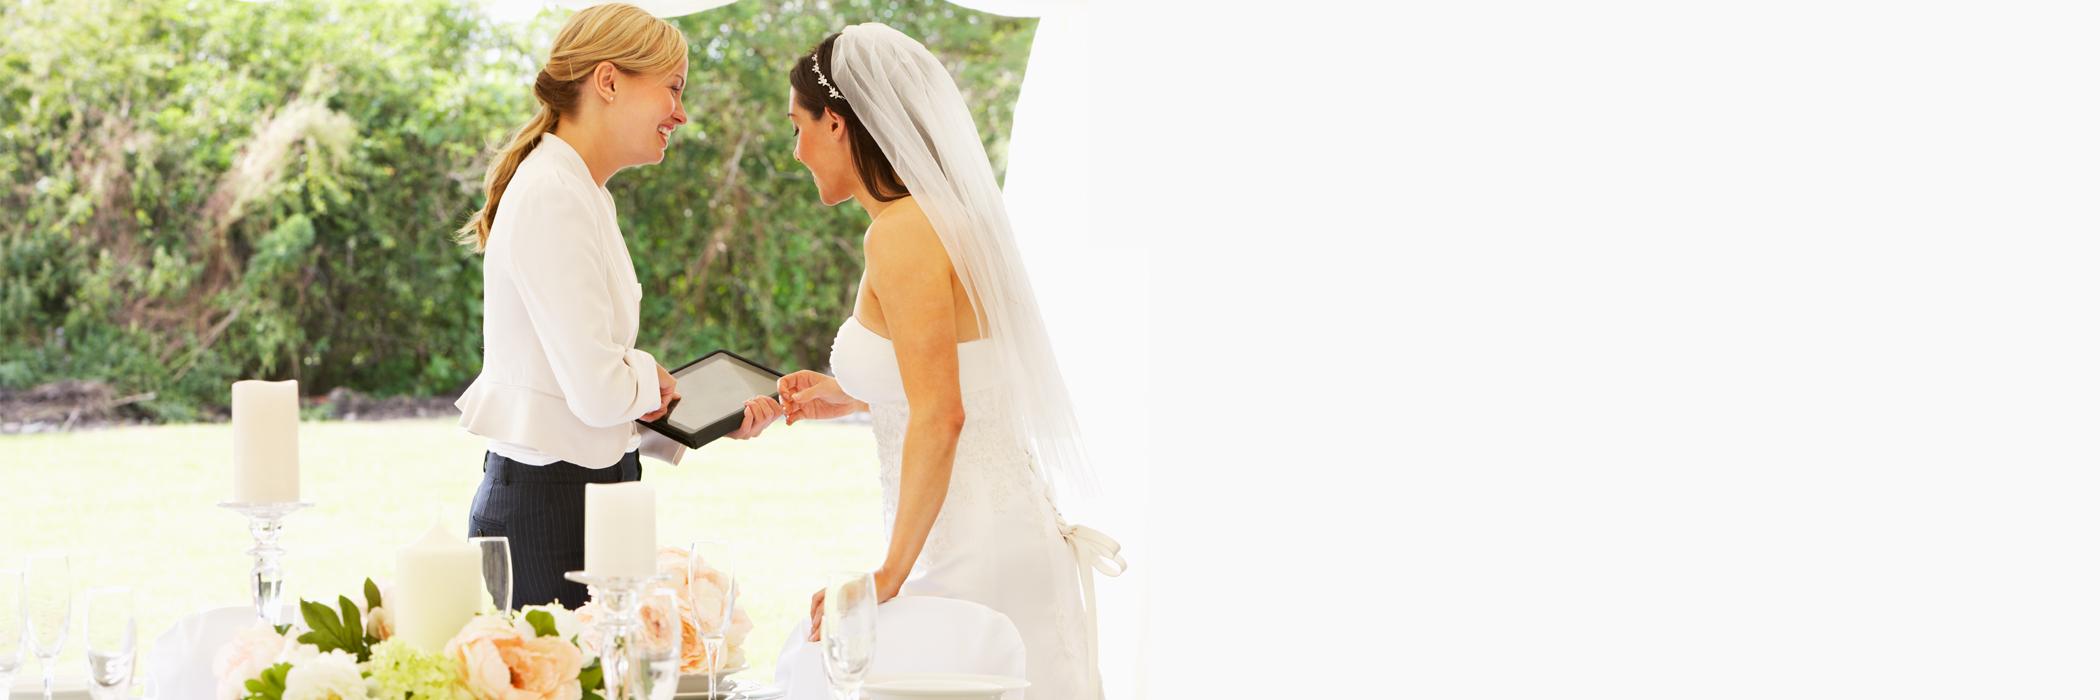 Dame d'Atour et jeune mariée